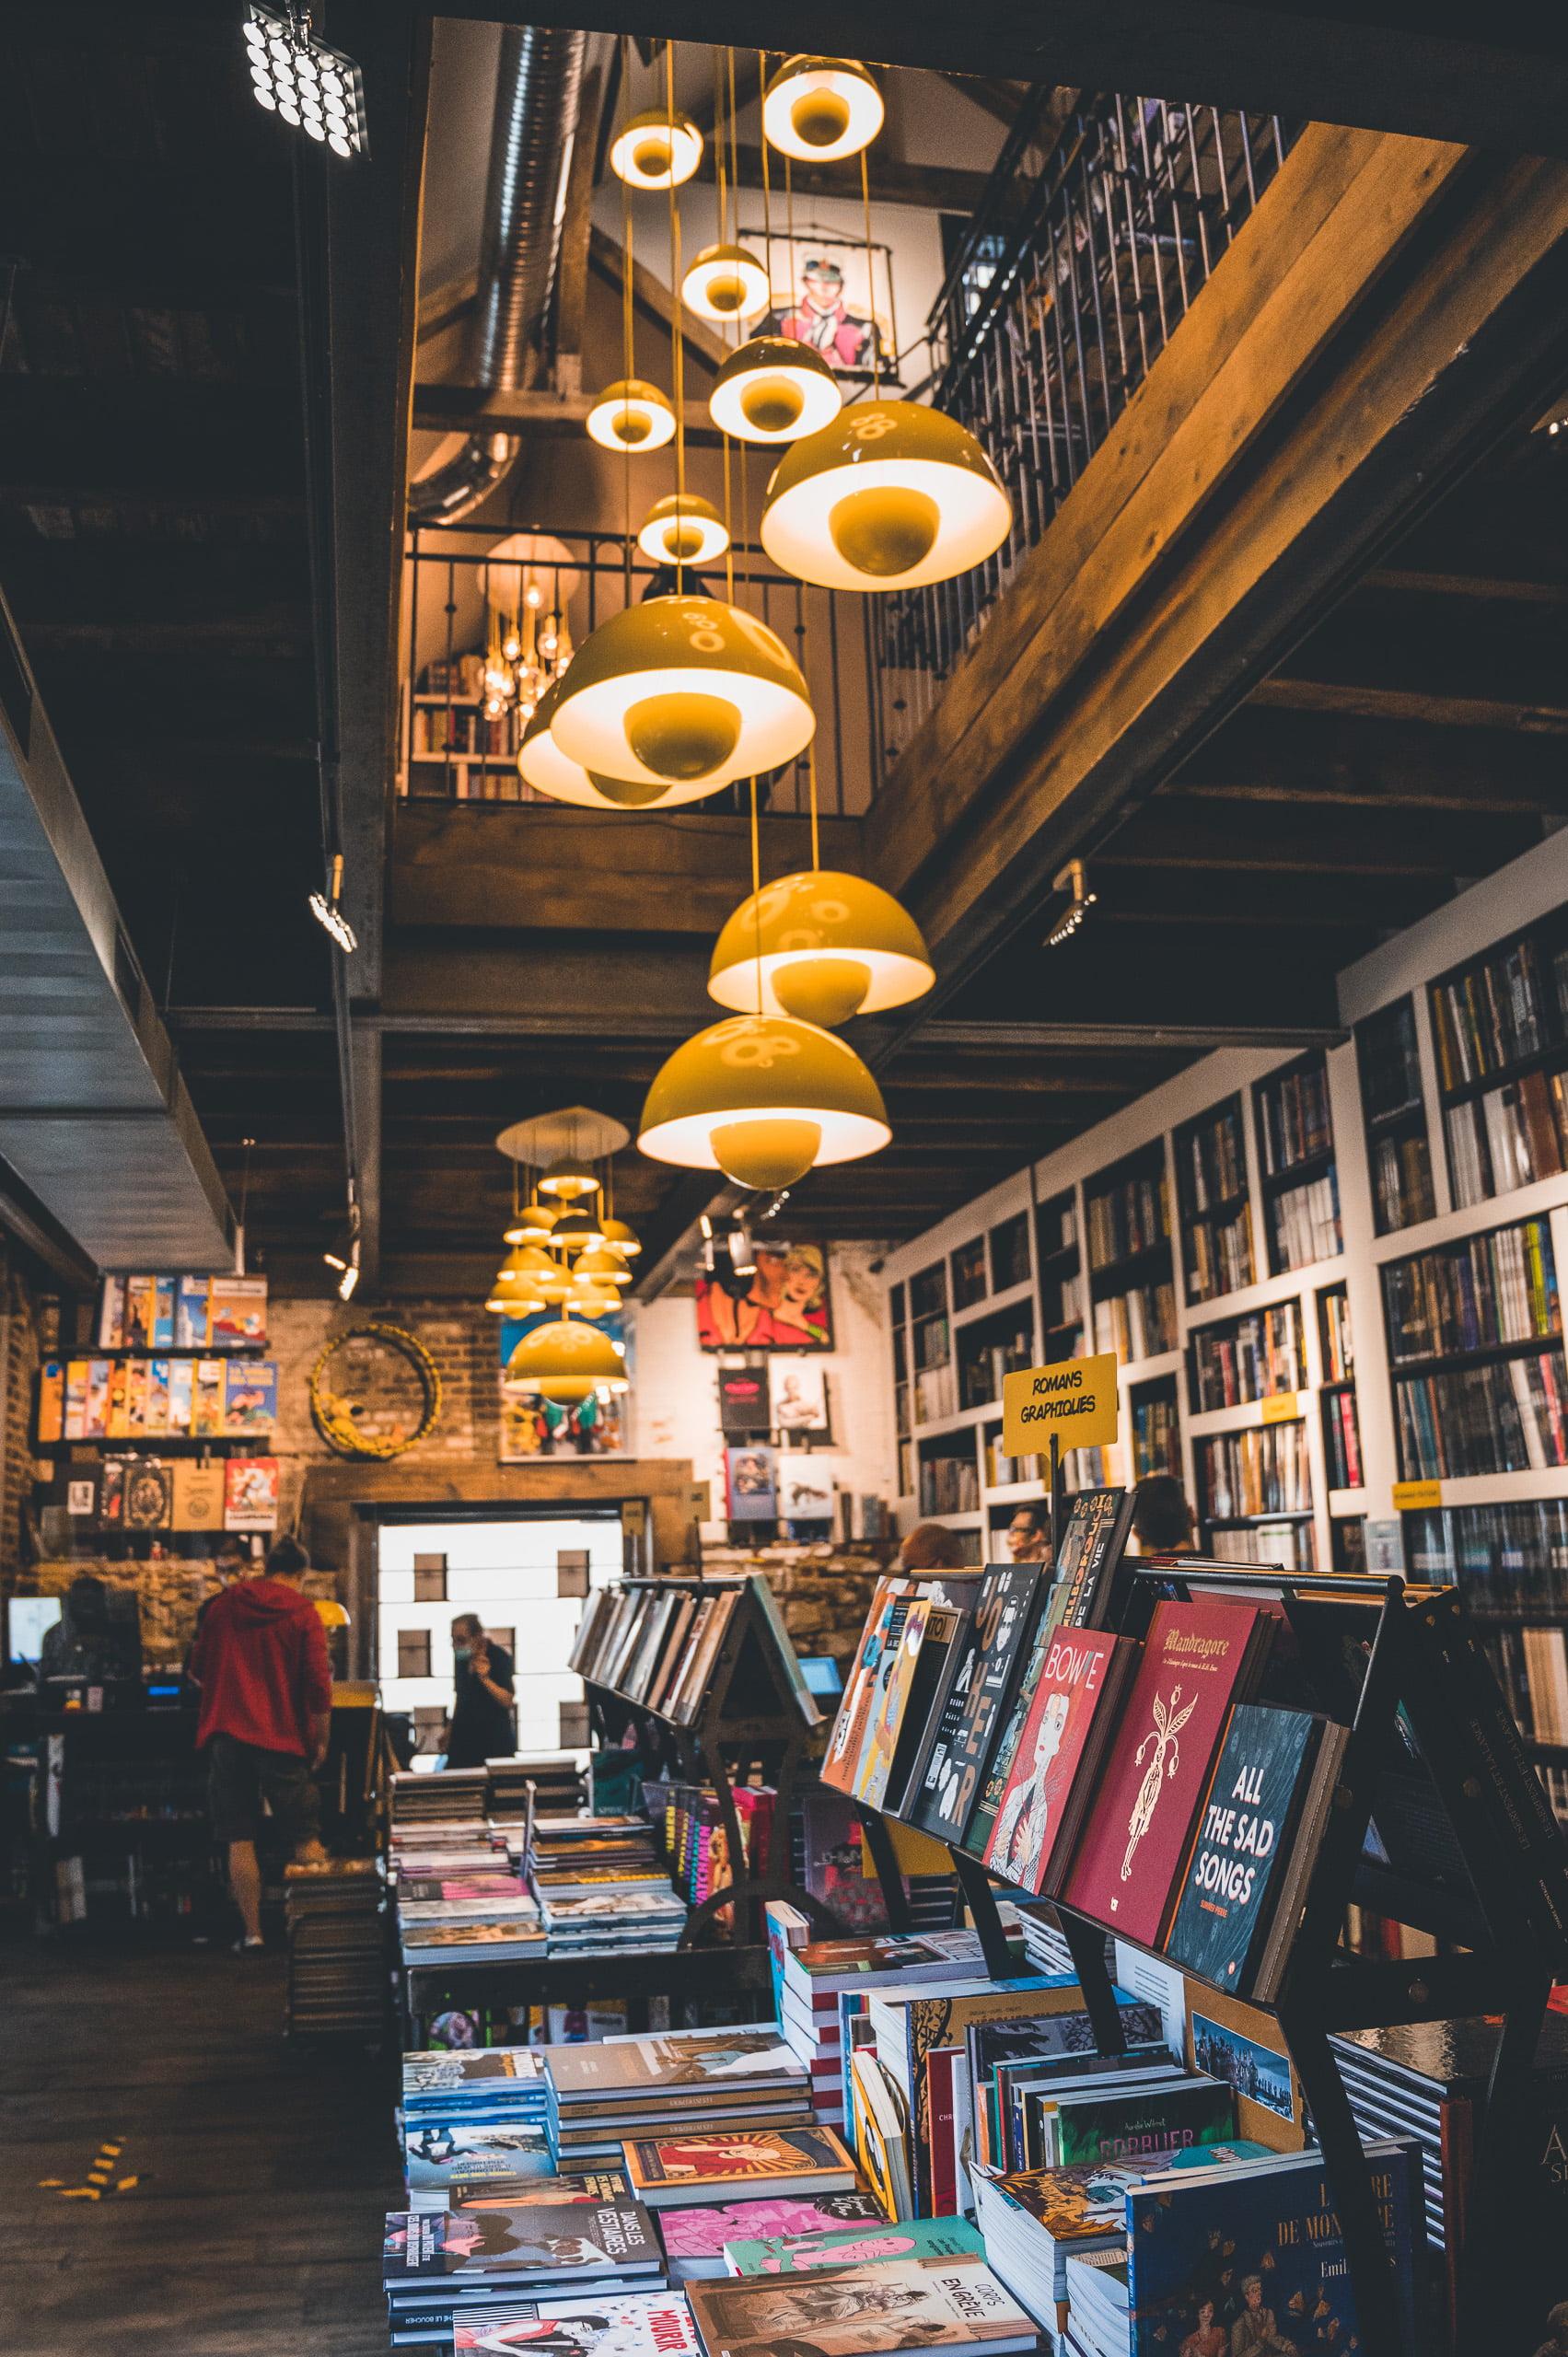 librairie bulle le mans